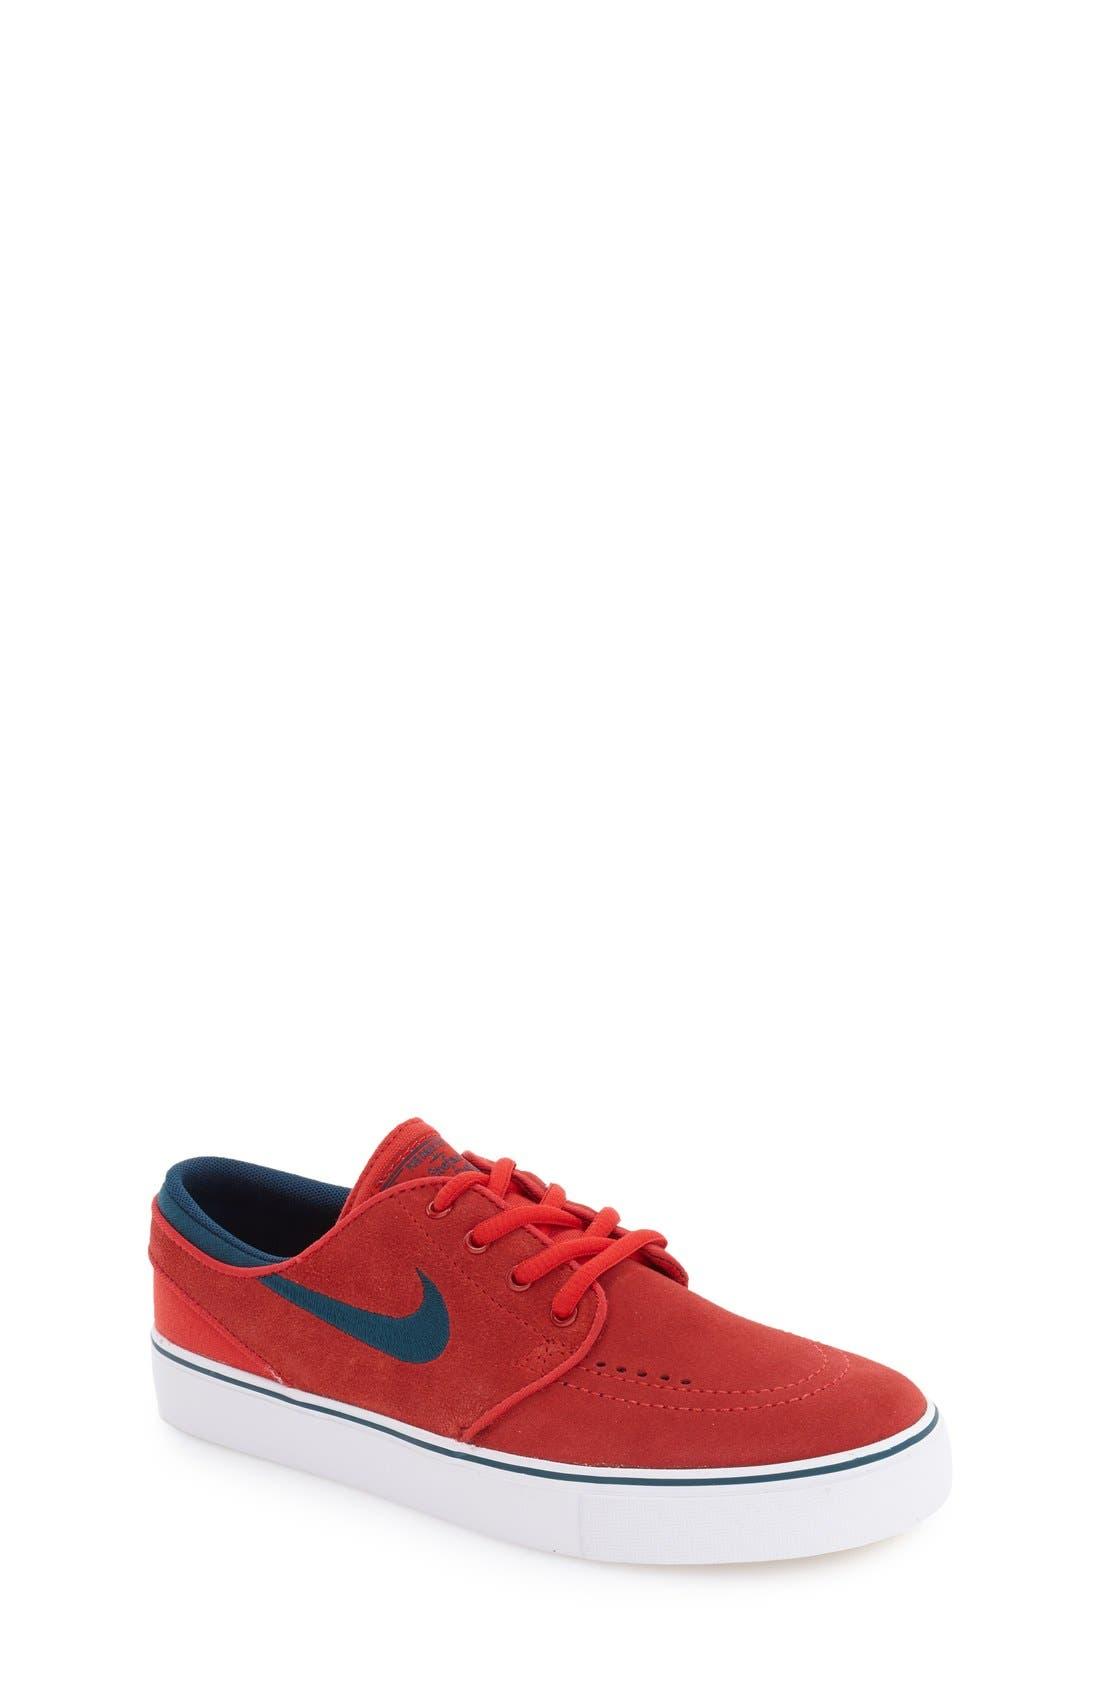 'Stefan Janoski' Sneaker,                             Main thumbnail 14, color,